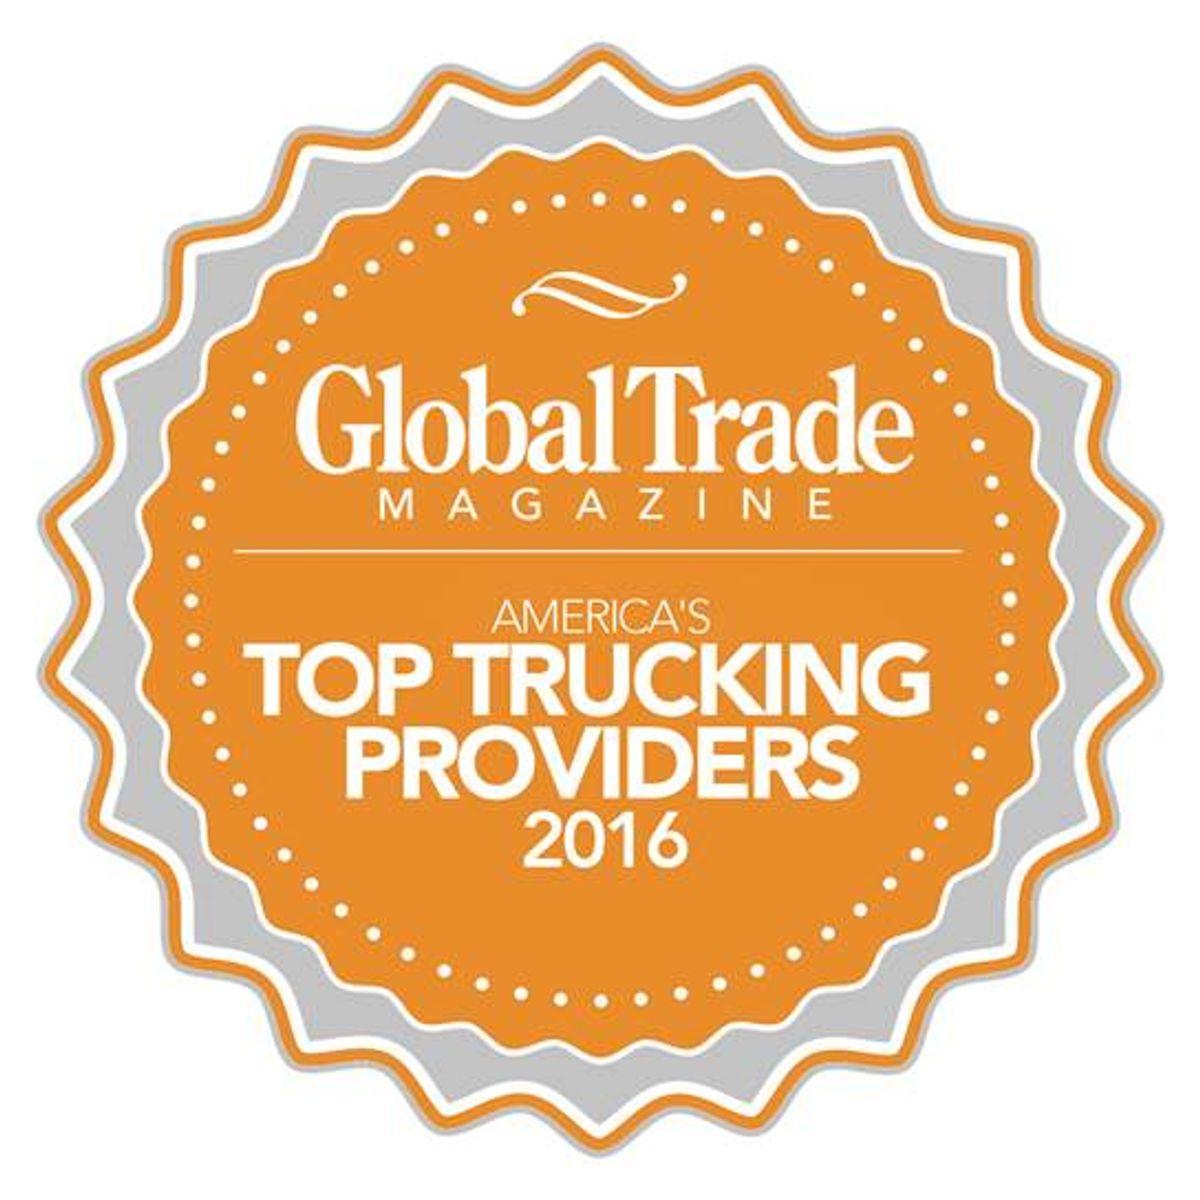 Penske Logistics is Global Trade Magazine Top Trucking Provider